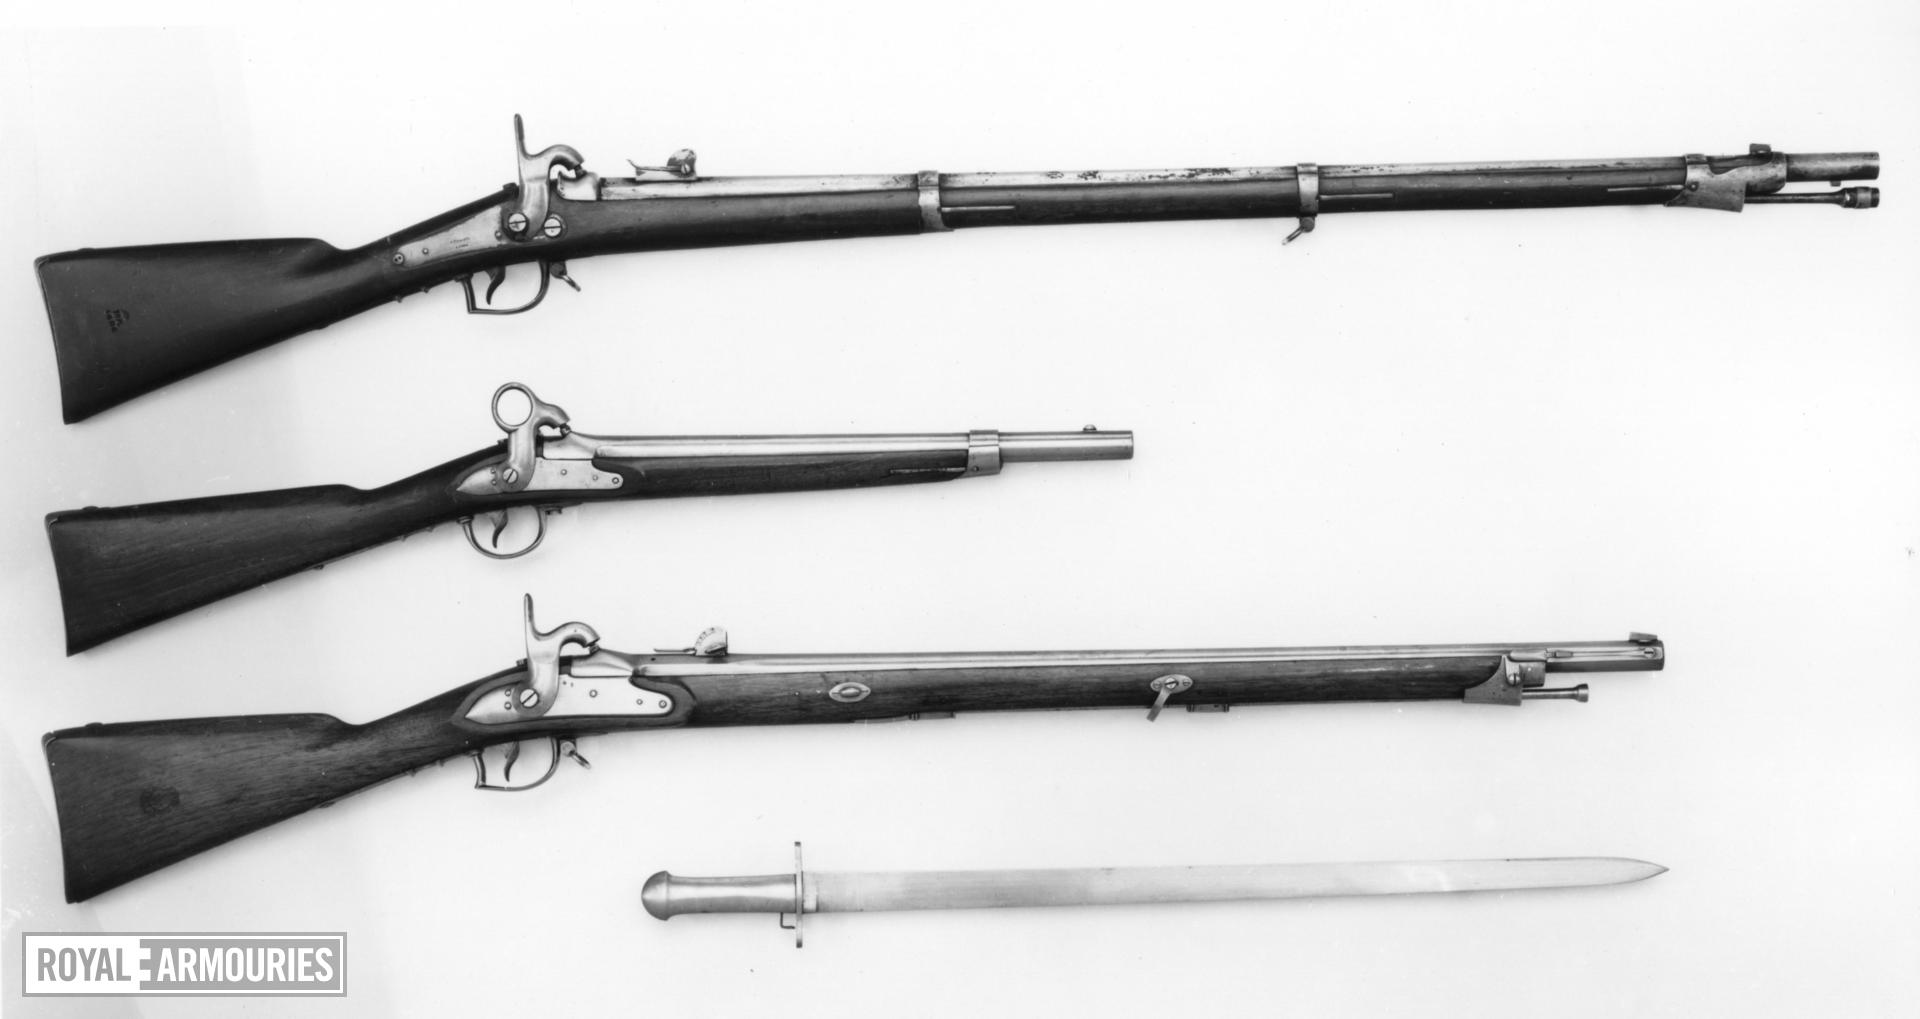 Percussion muzzle-loading military musket - Model 1845